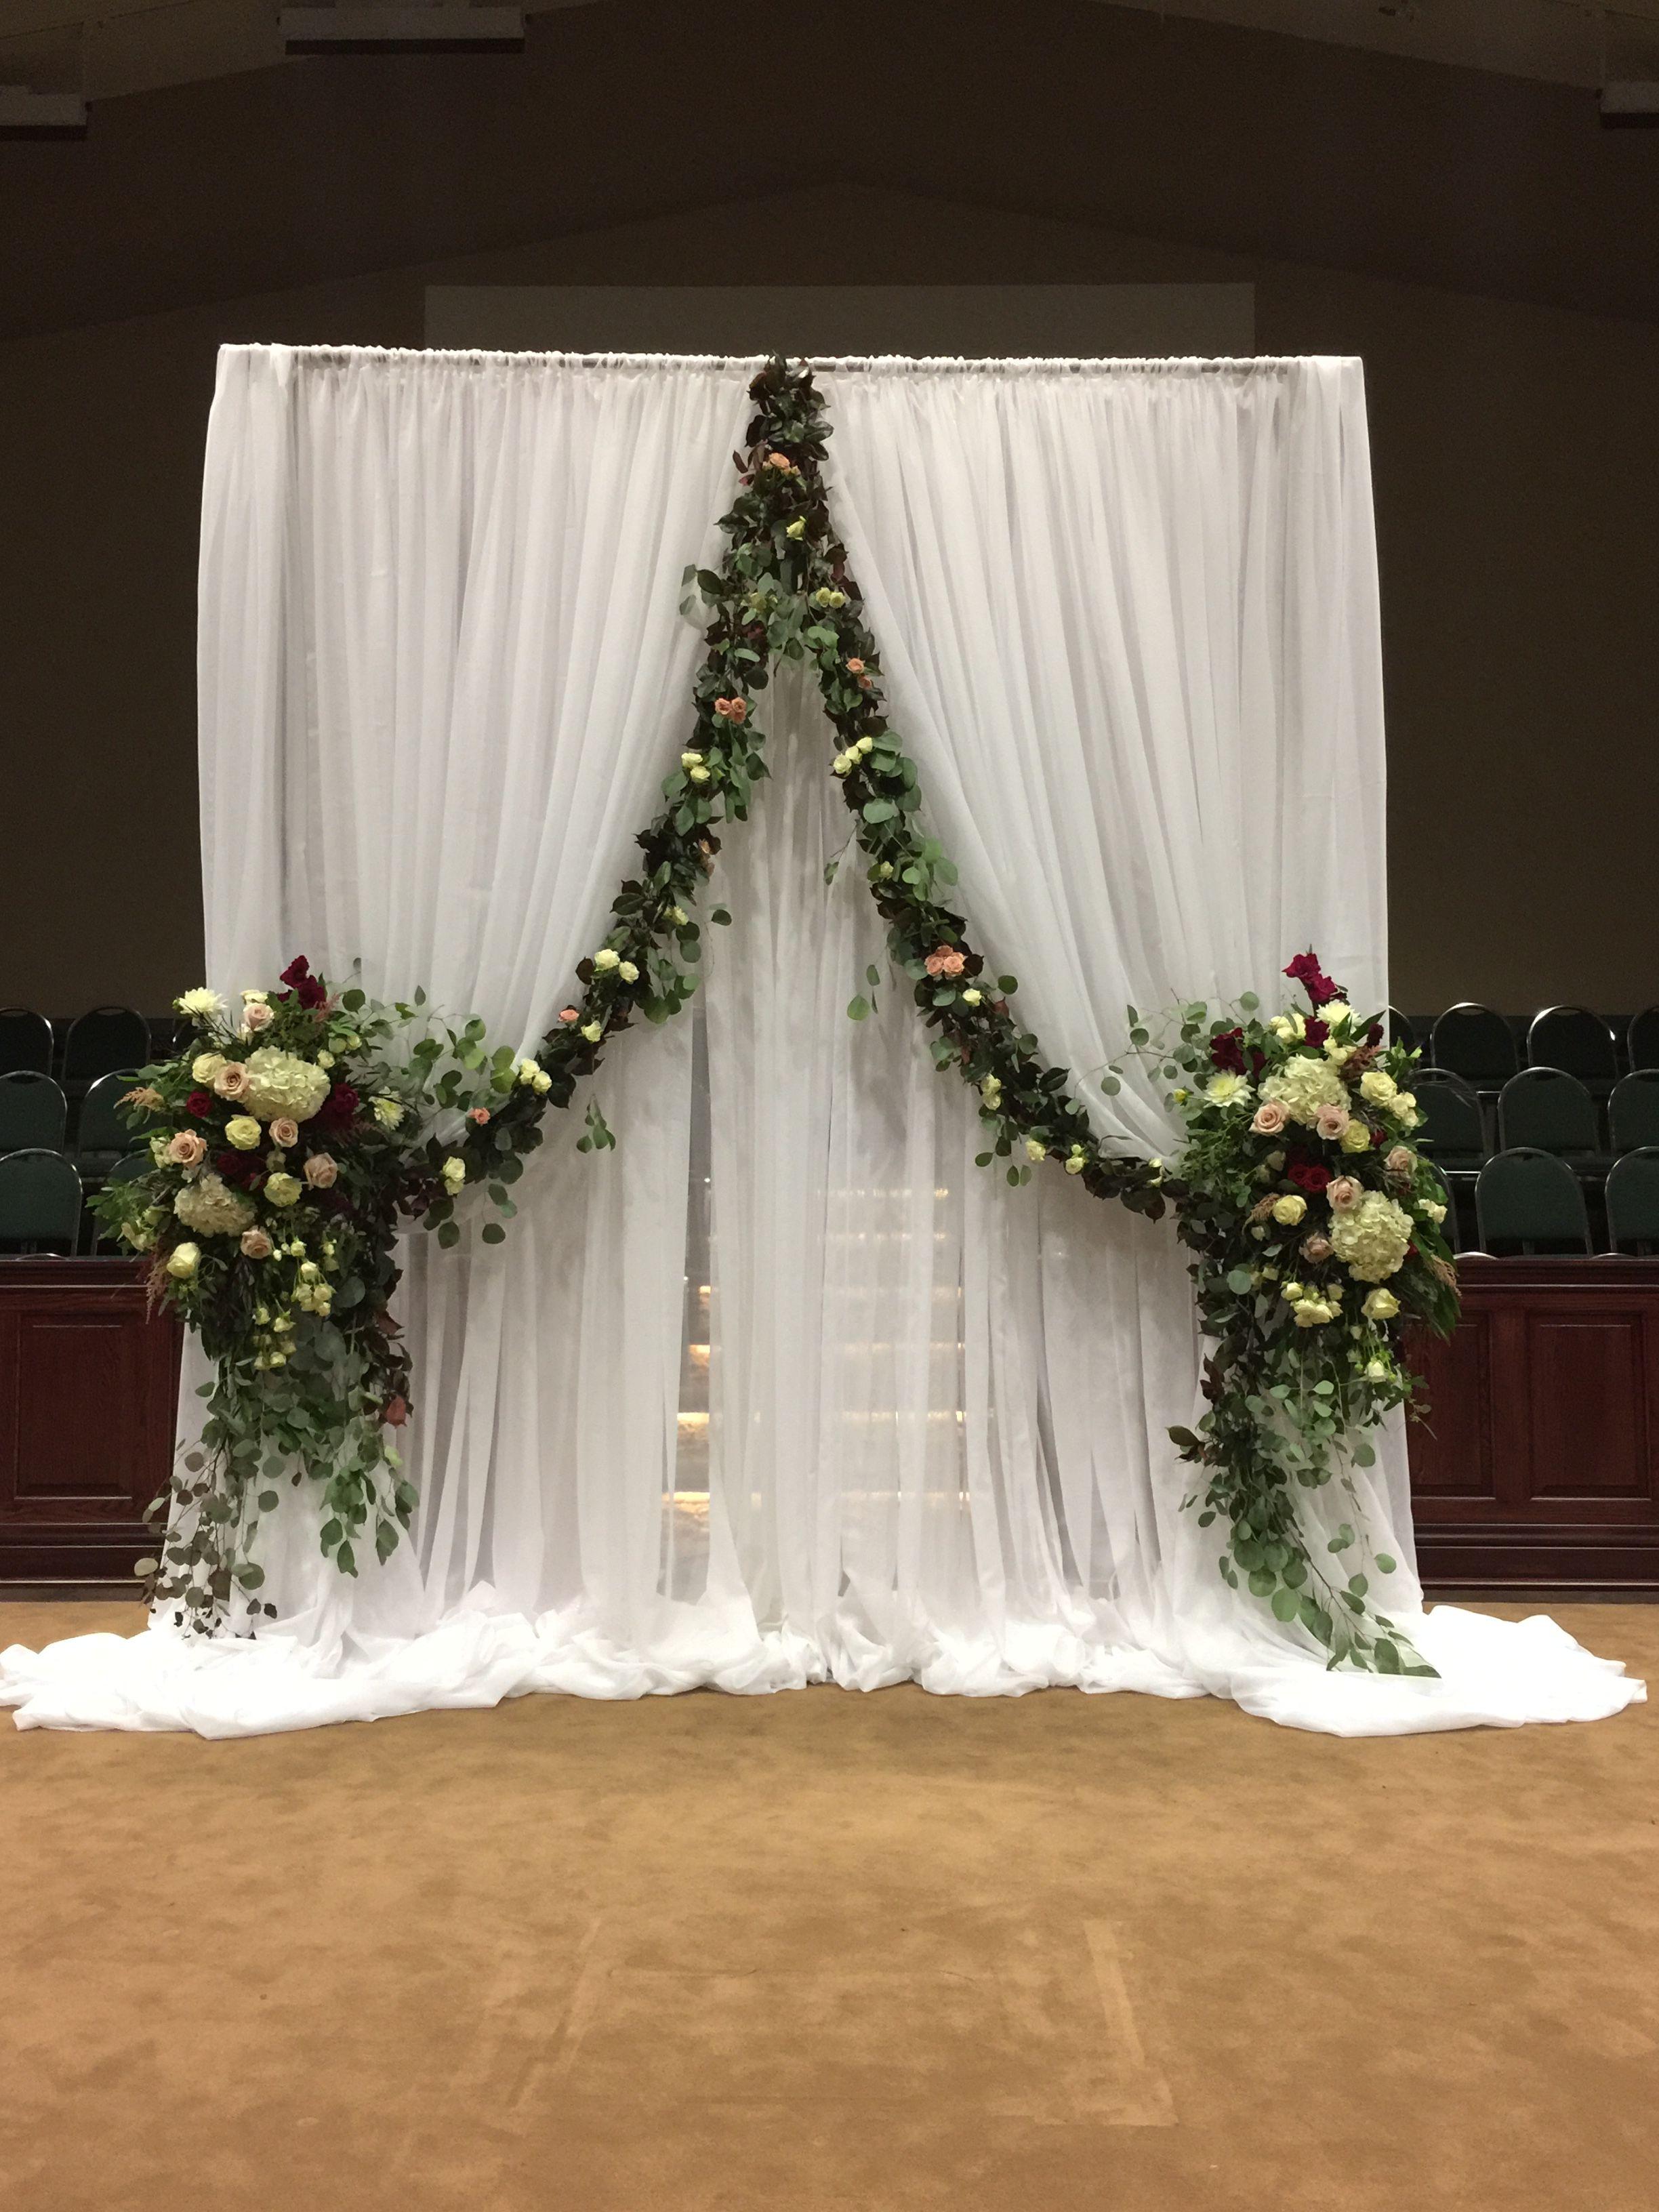 Ceremony Decor Church Wedding Decorations Diy Wedding Backdrop